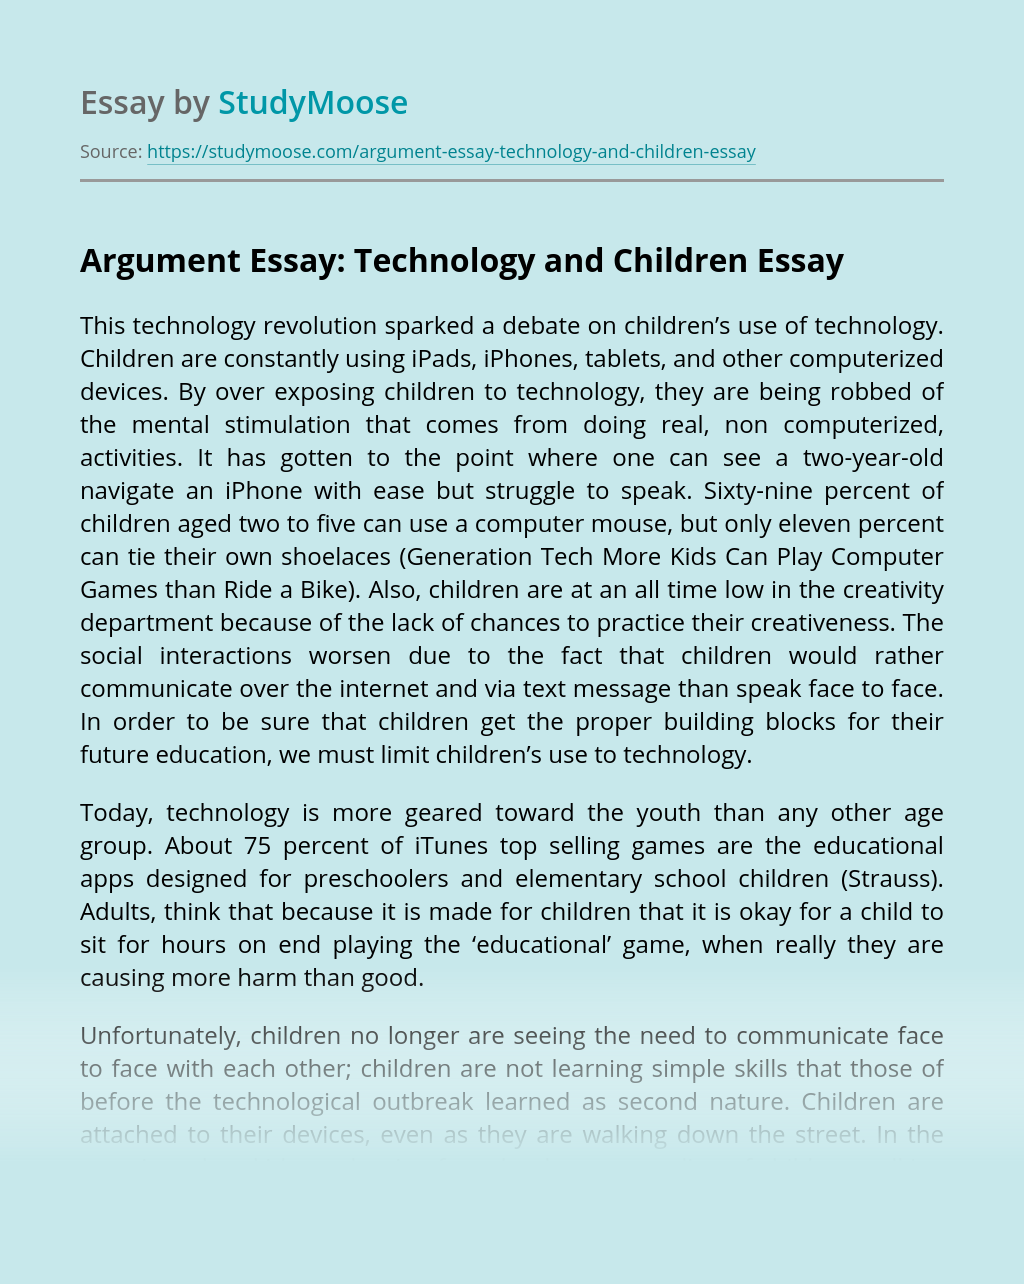 Argument Essay: Technology and Children